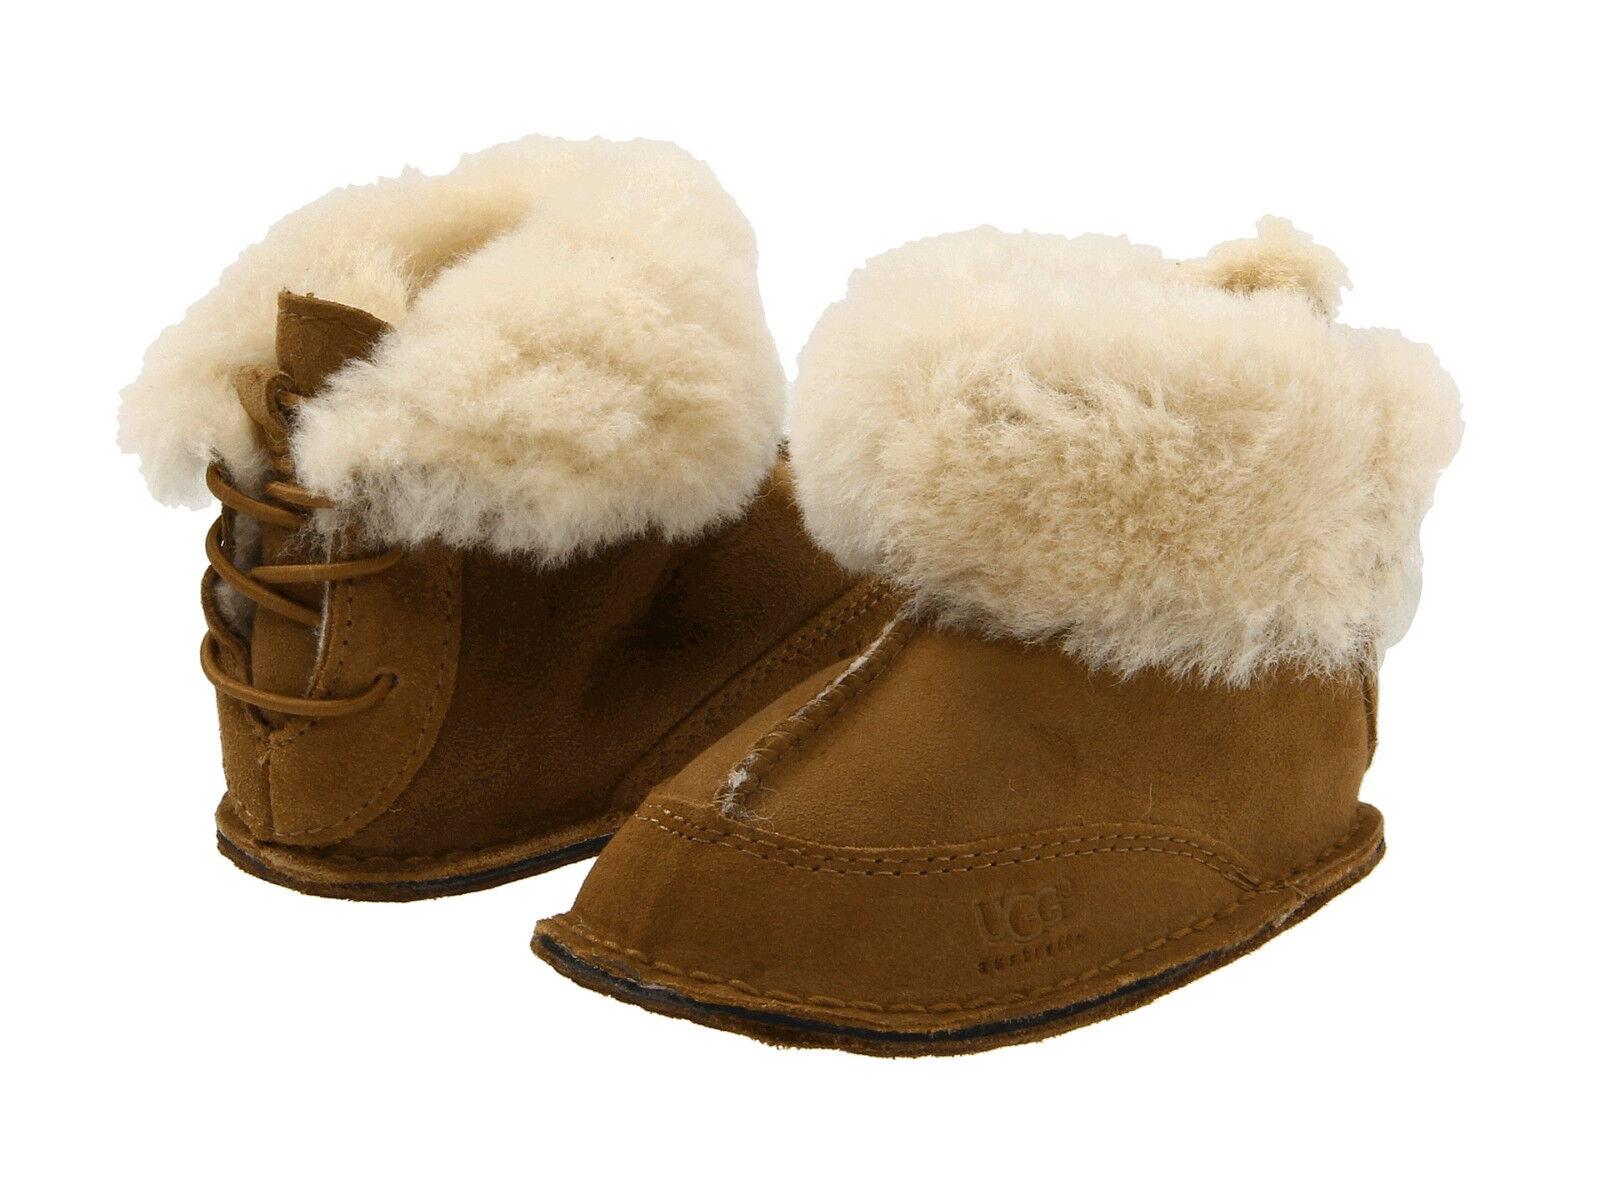 c56ac803af3 Baby Infant Toddler UGG Australia 5206 Leather Shearling I Boo BOOTS Medium